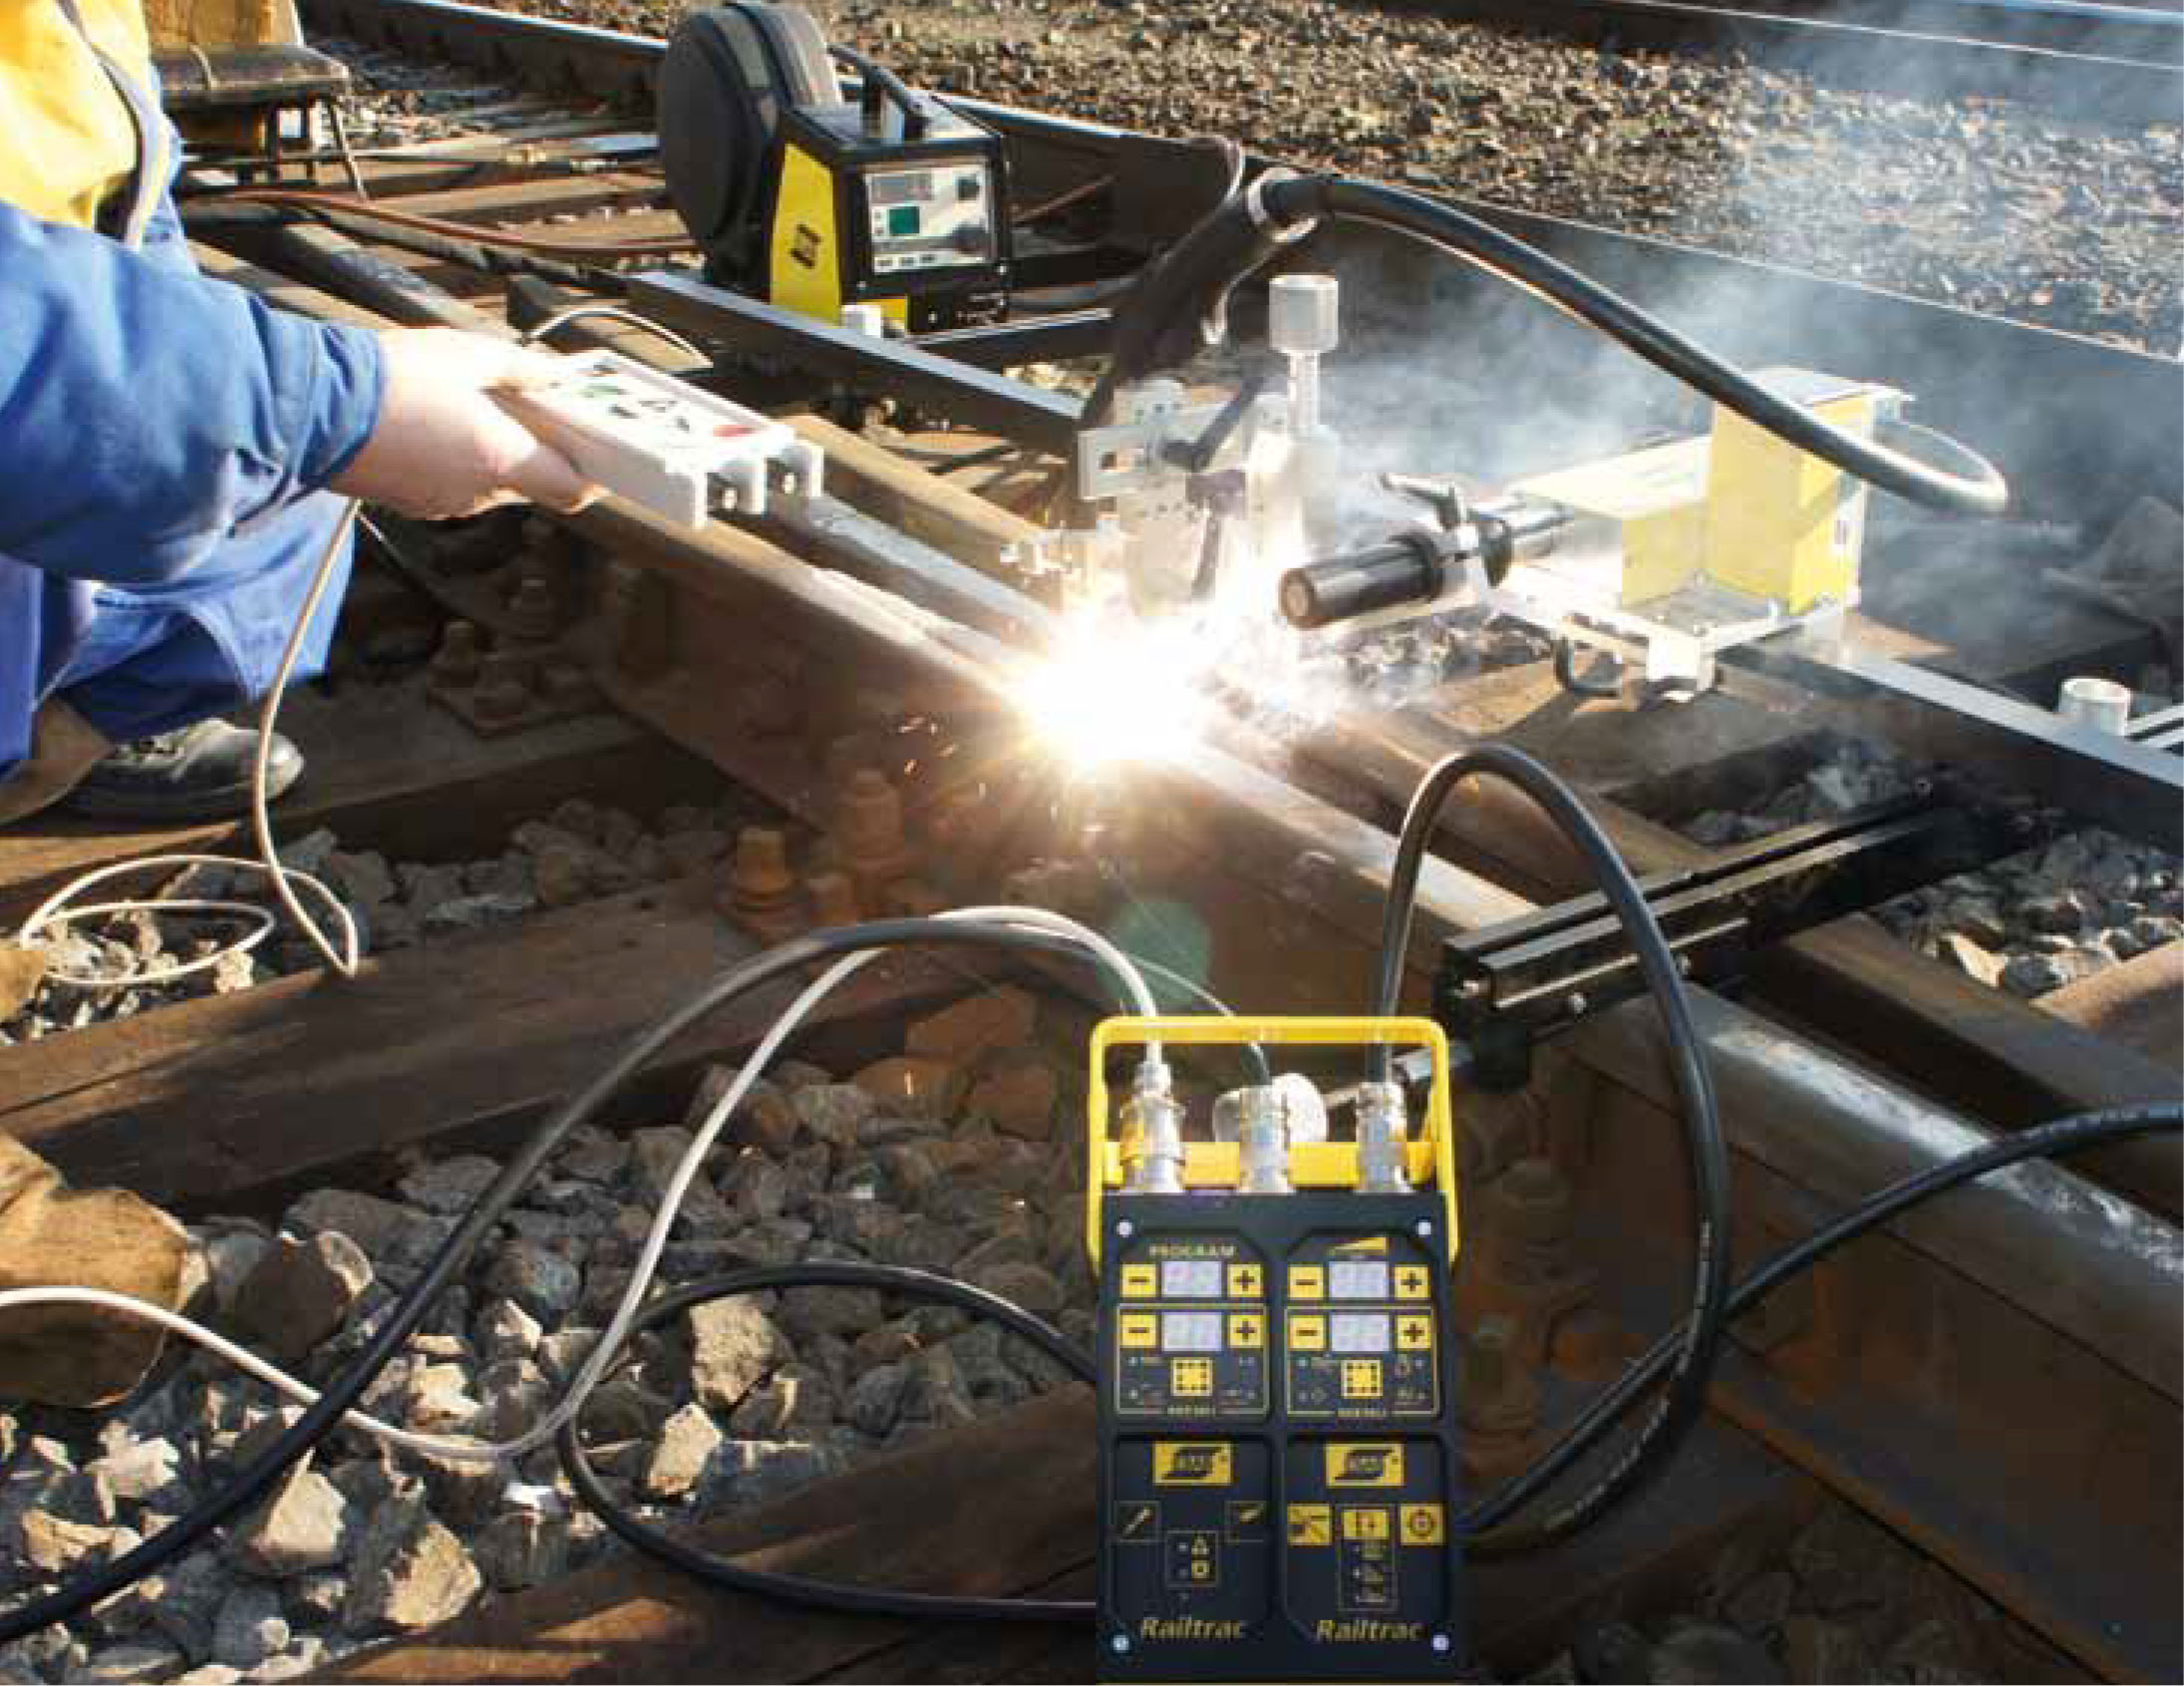 Railtrac-BV1000-BVR1000_XA00067820-EN-1